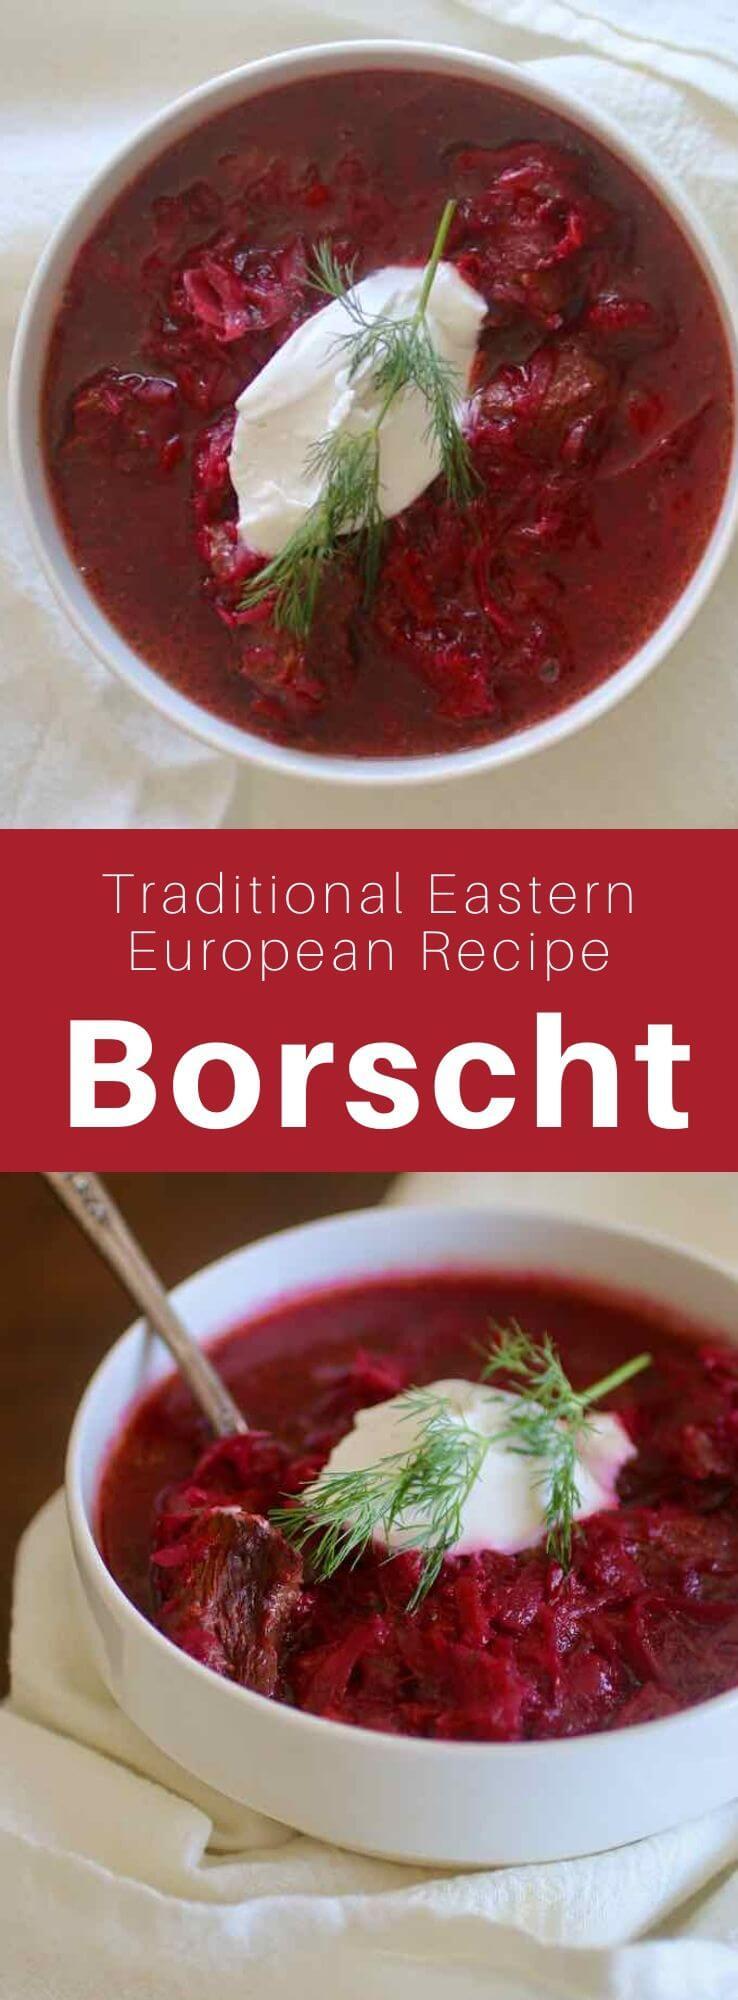 Borscht Traditional Eastern European Soup Recipe 196 Flavors